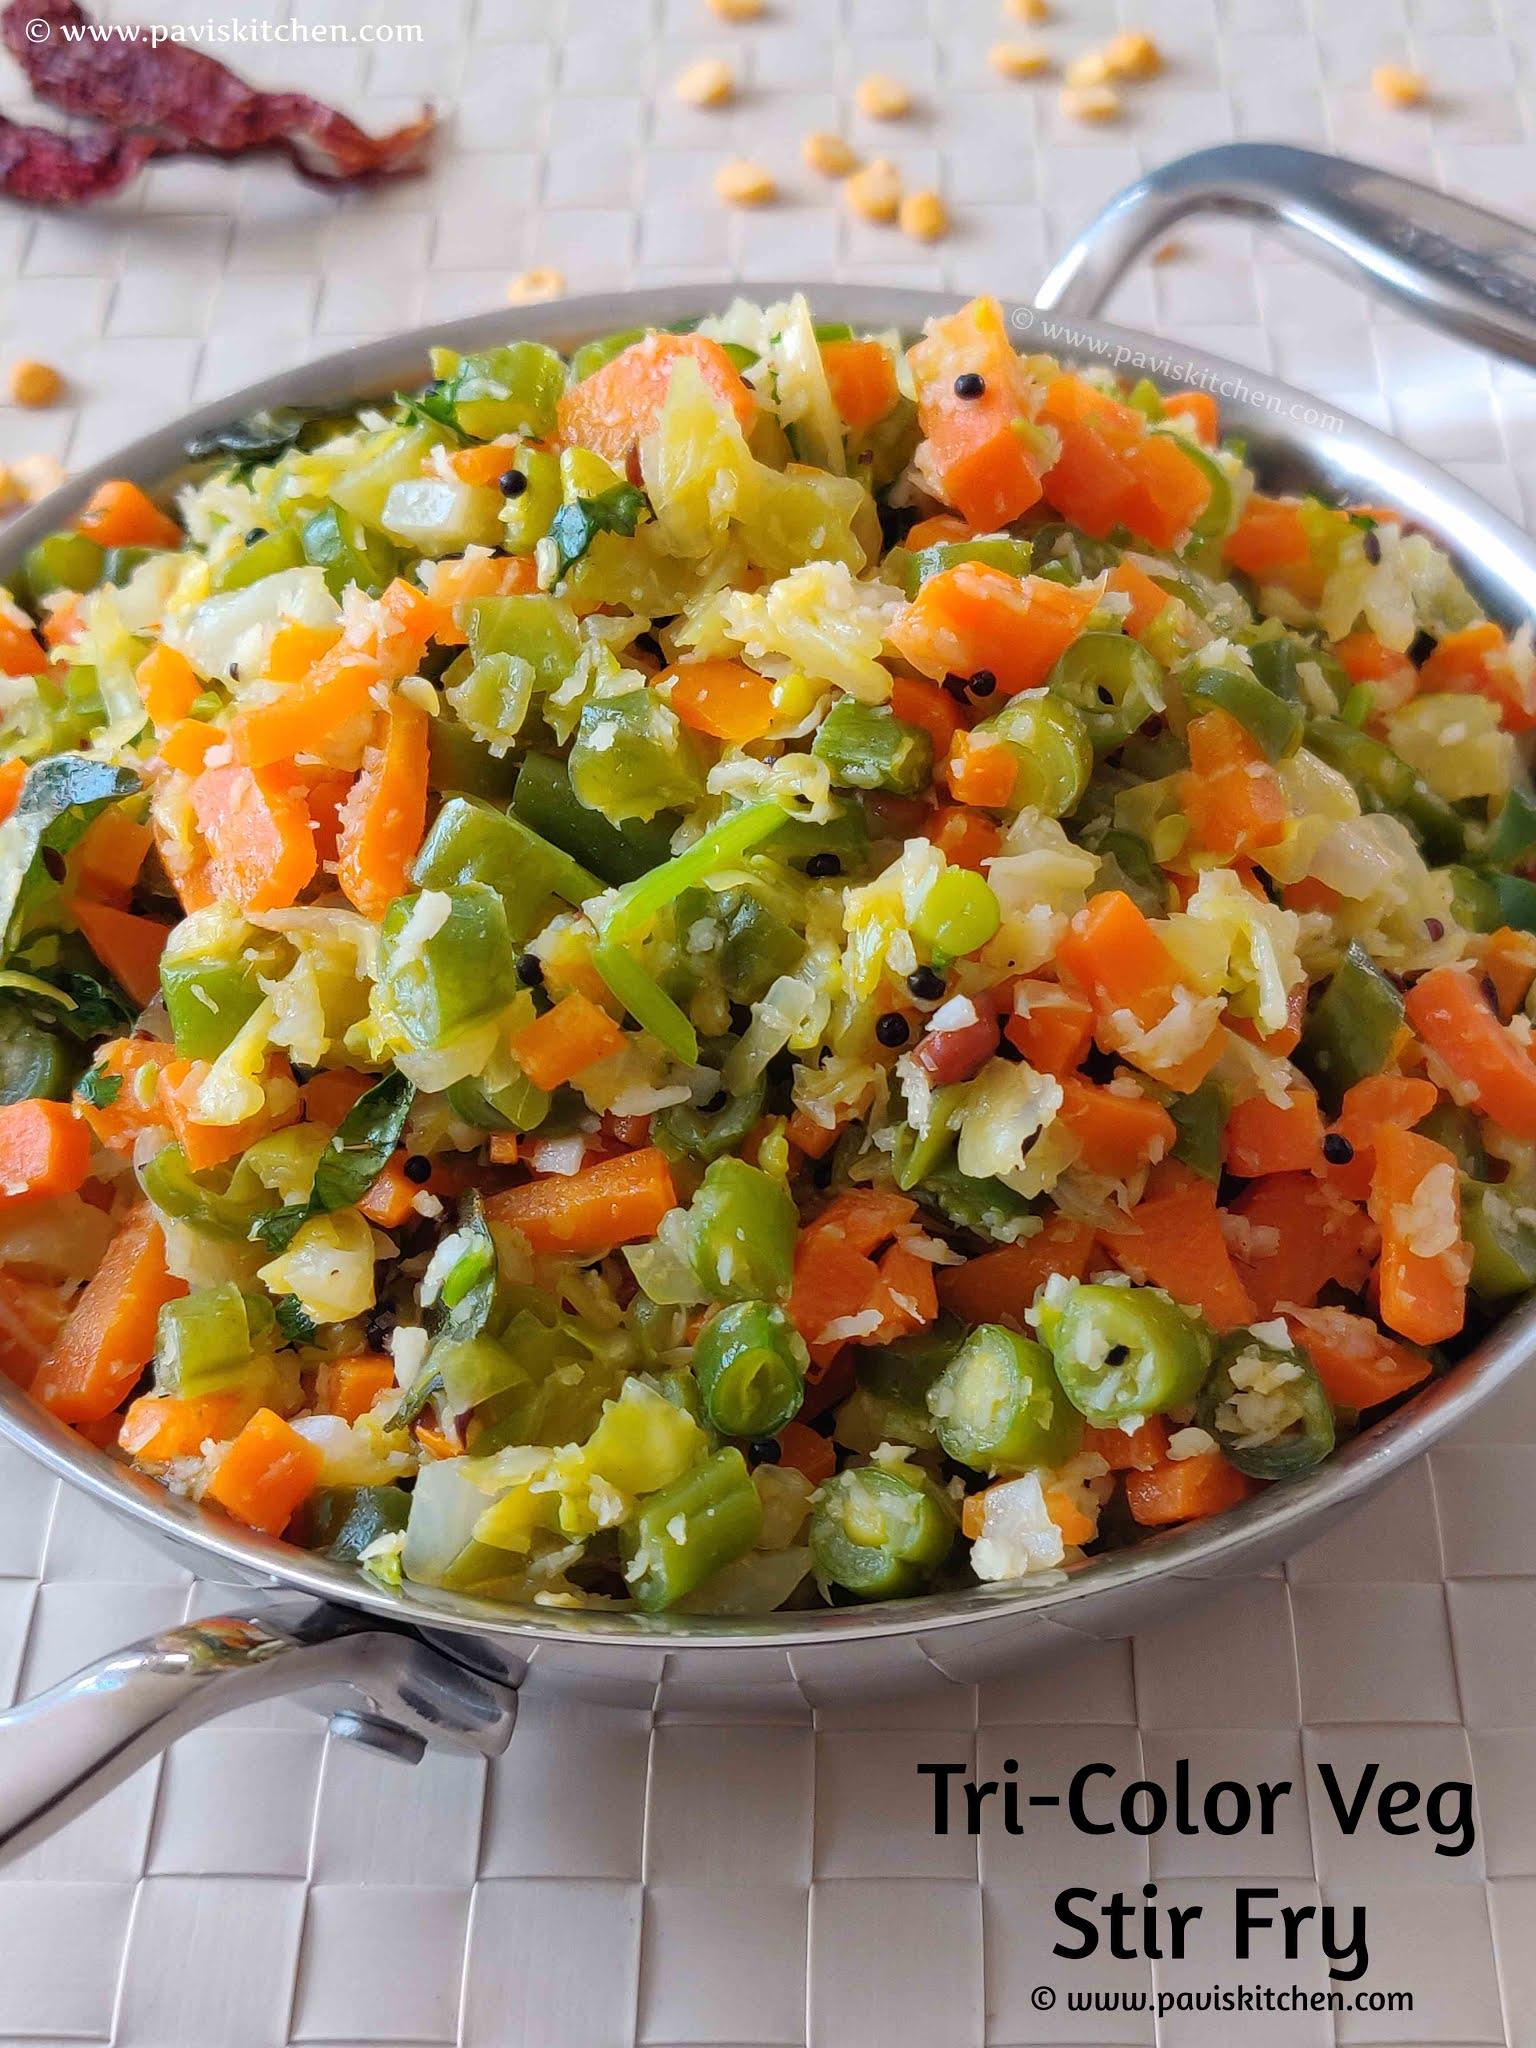 Tri-color poriyal recipe | Carrot beans cabbage poriyal | kadamba kalyana veetu poriyal